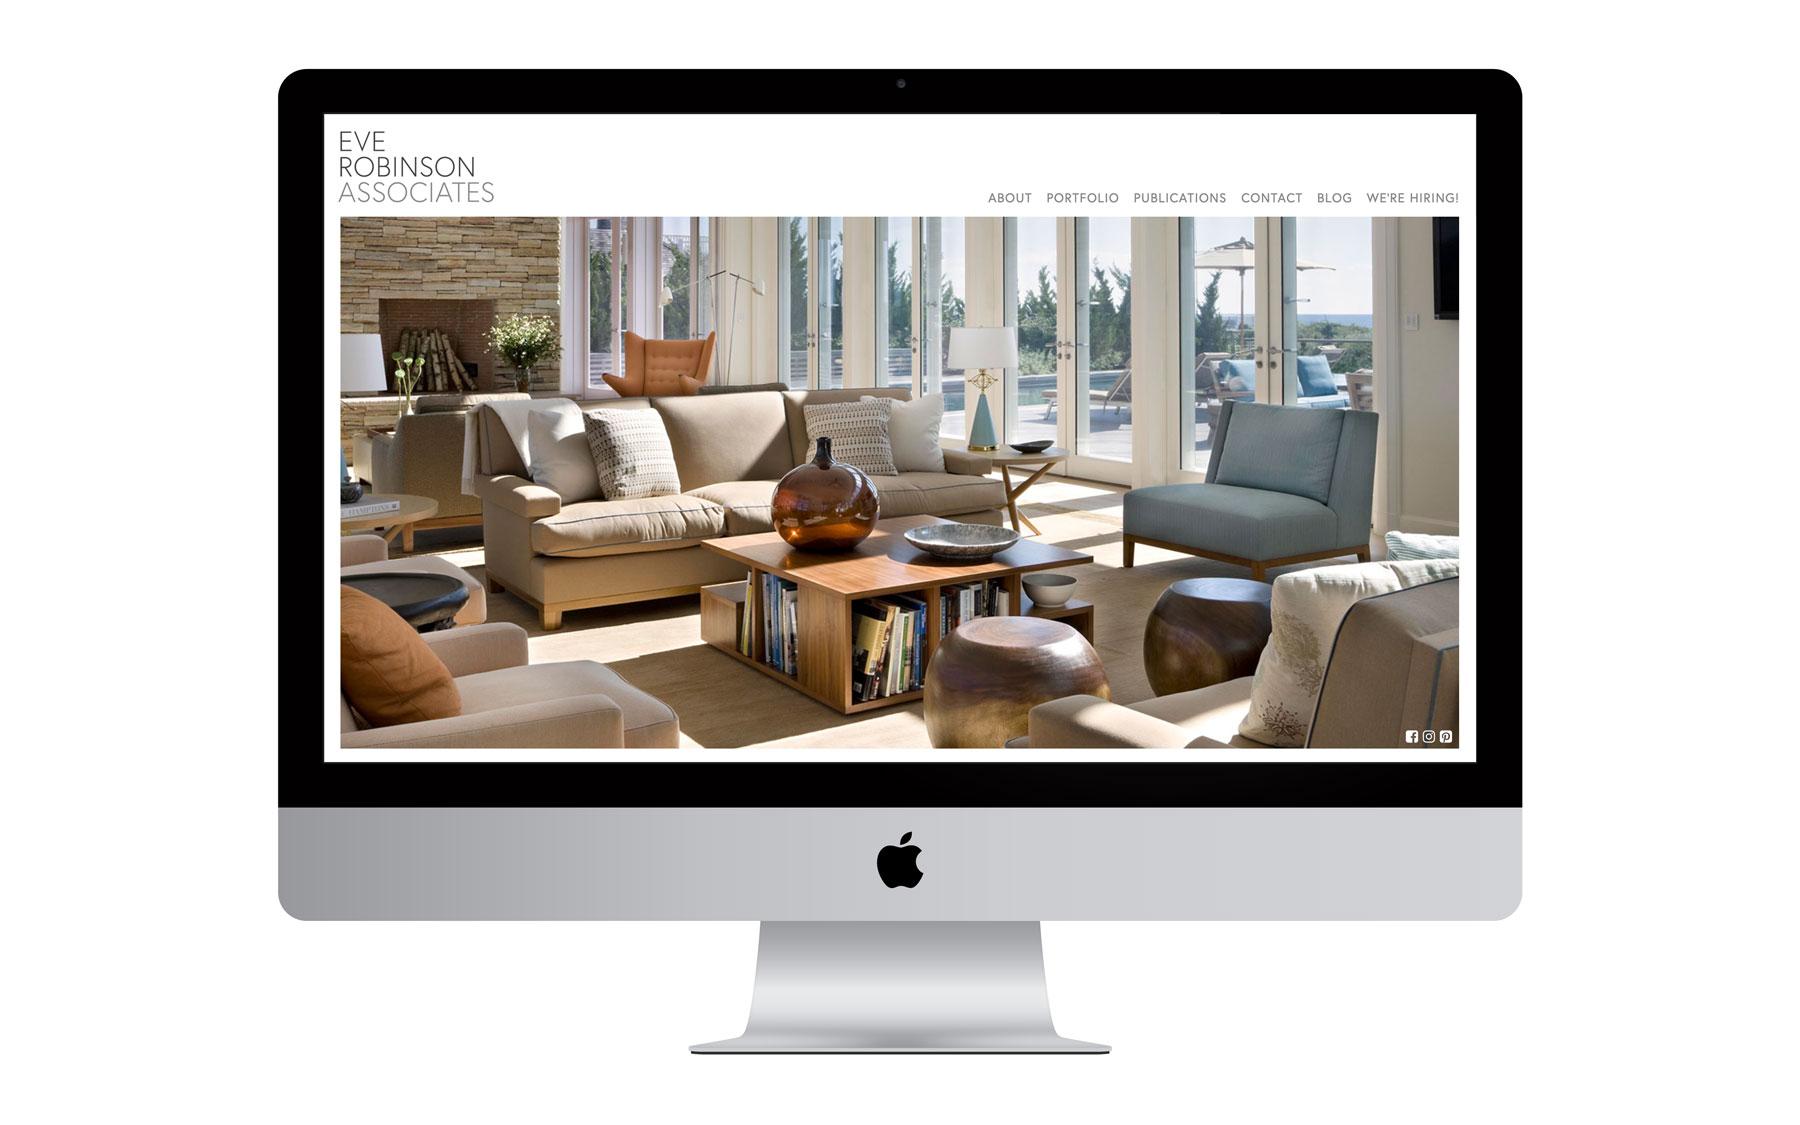 Eve Robinson Associates Website